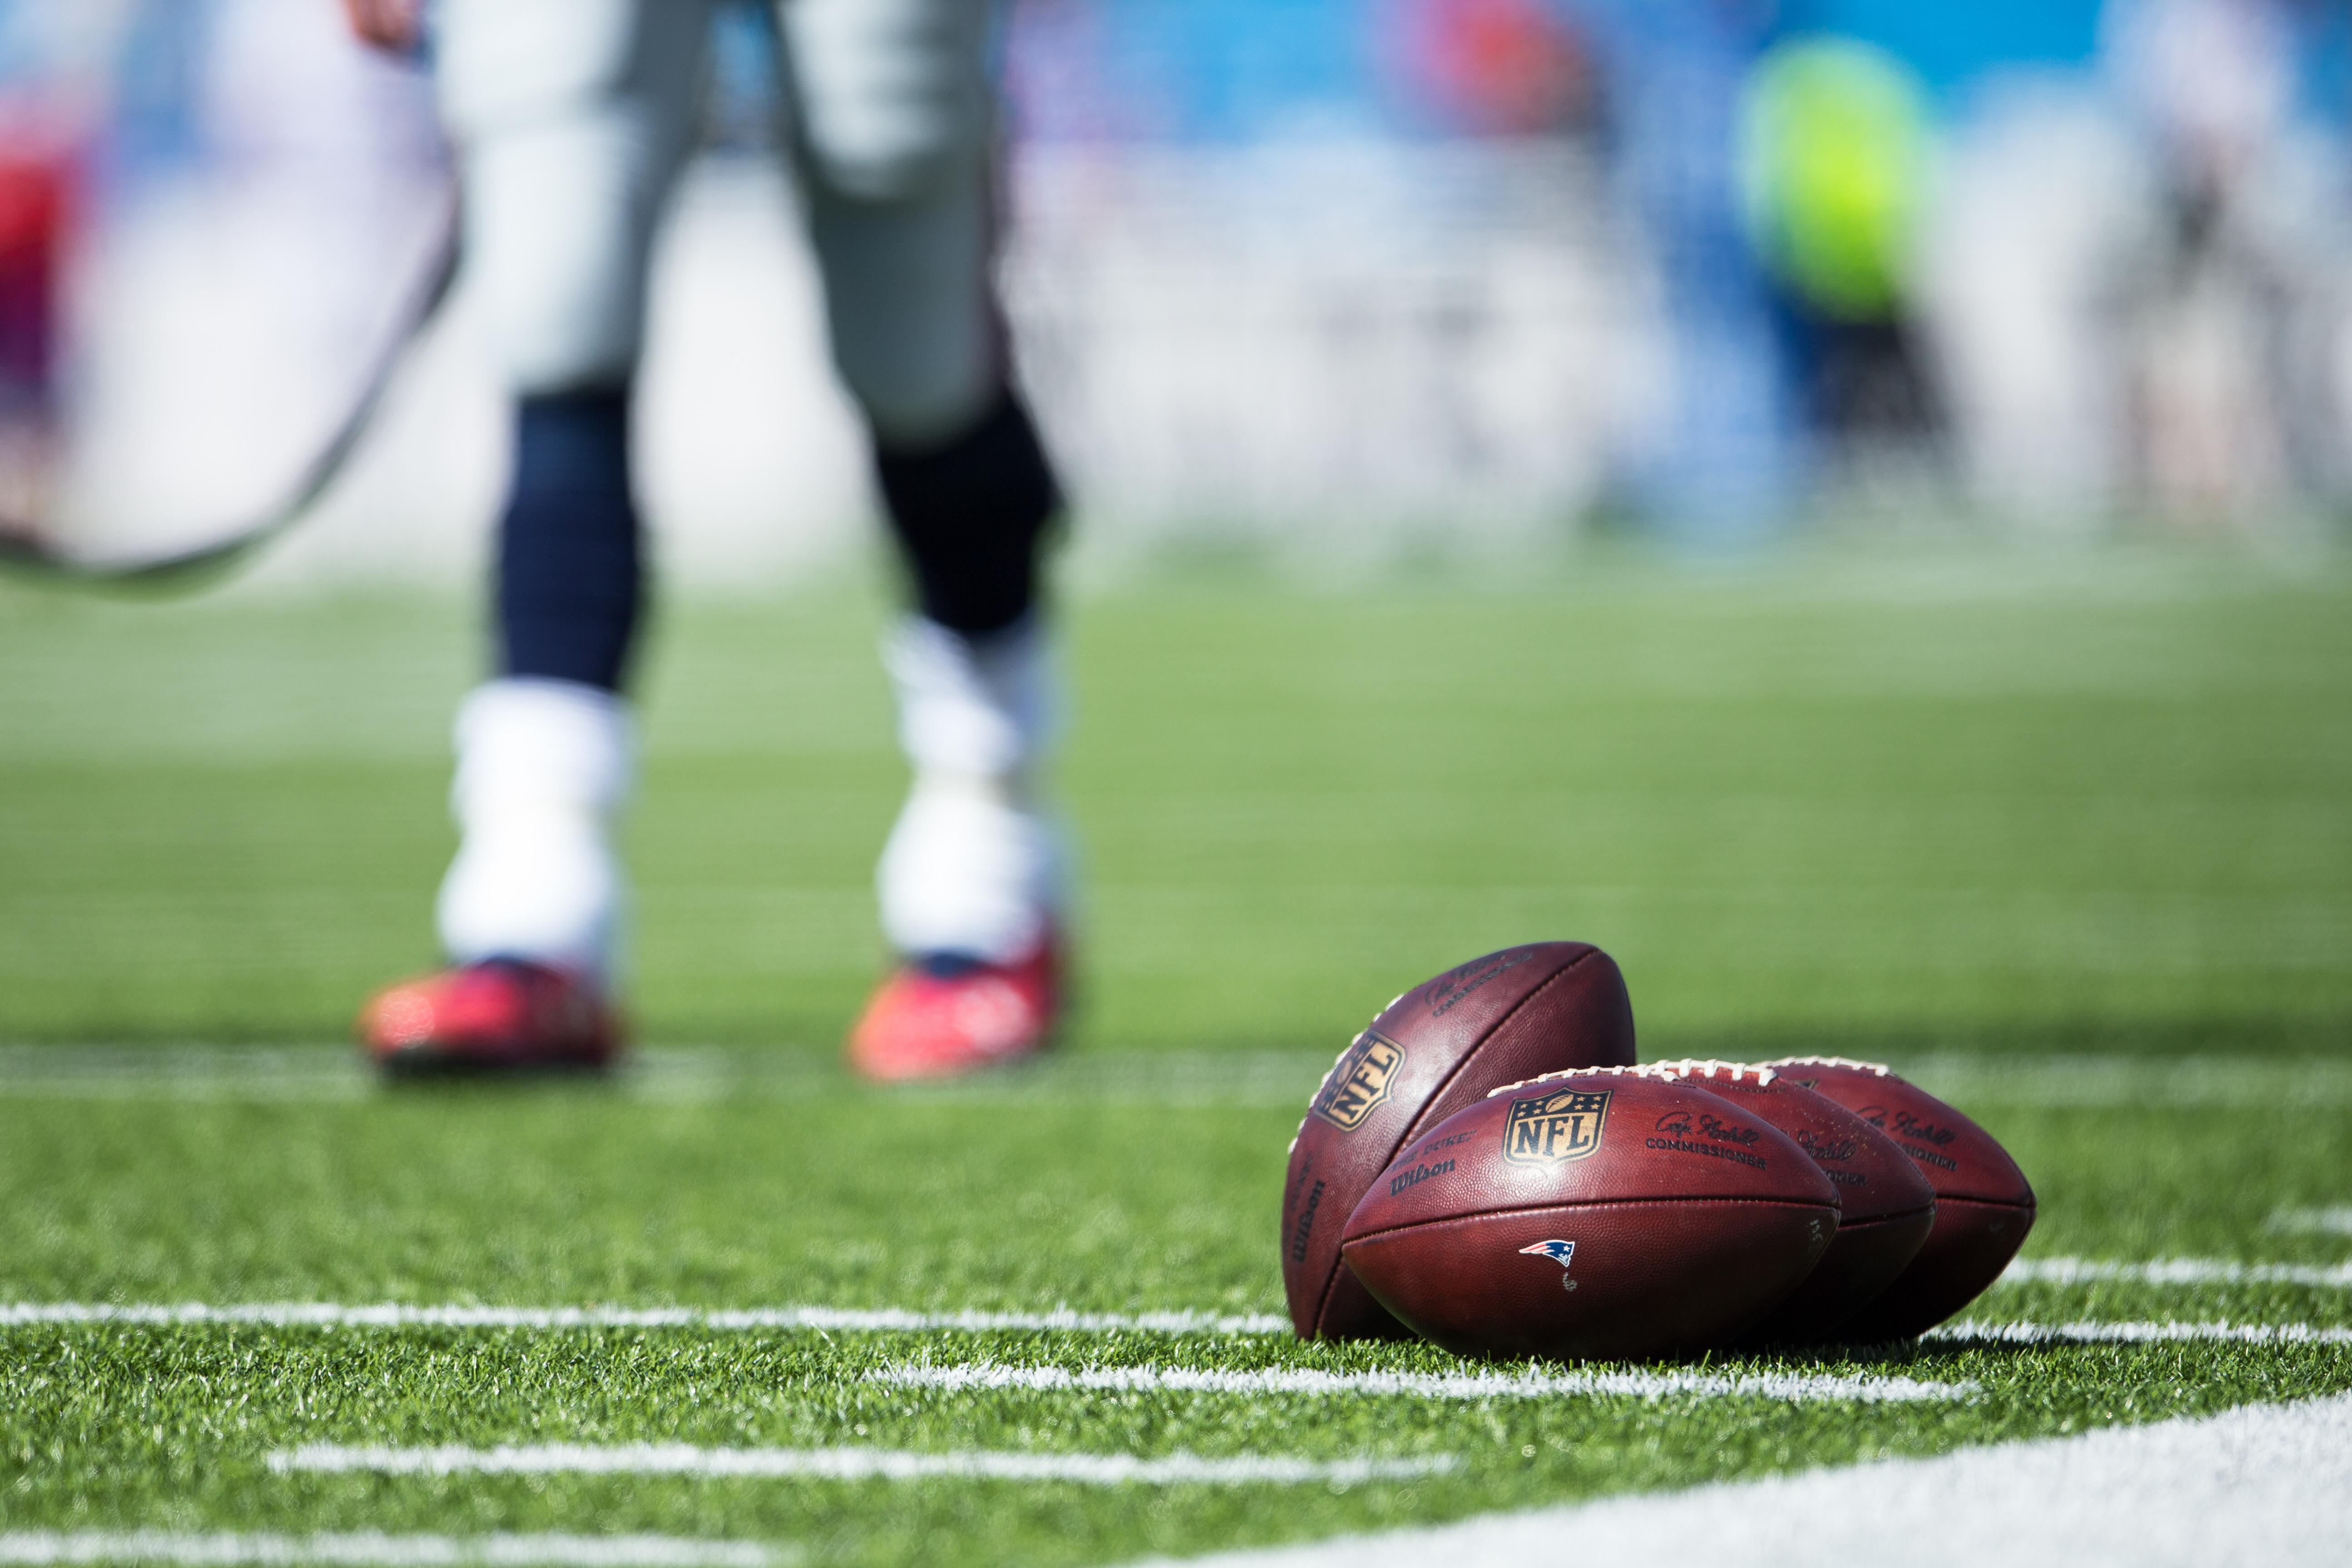 Wilson NFL Footballs at Ralph Wilson Stadium in Orchard Park, New York, on Sept. 20, 2015.